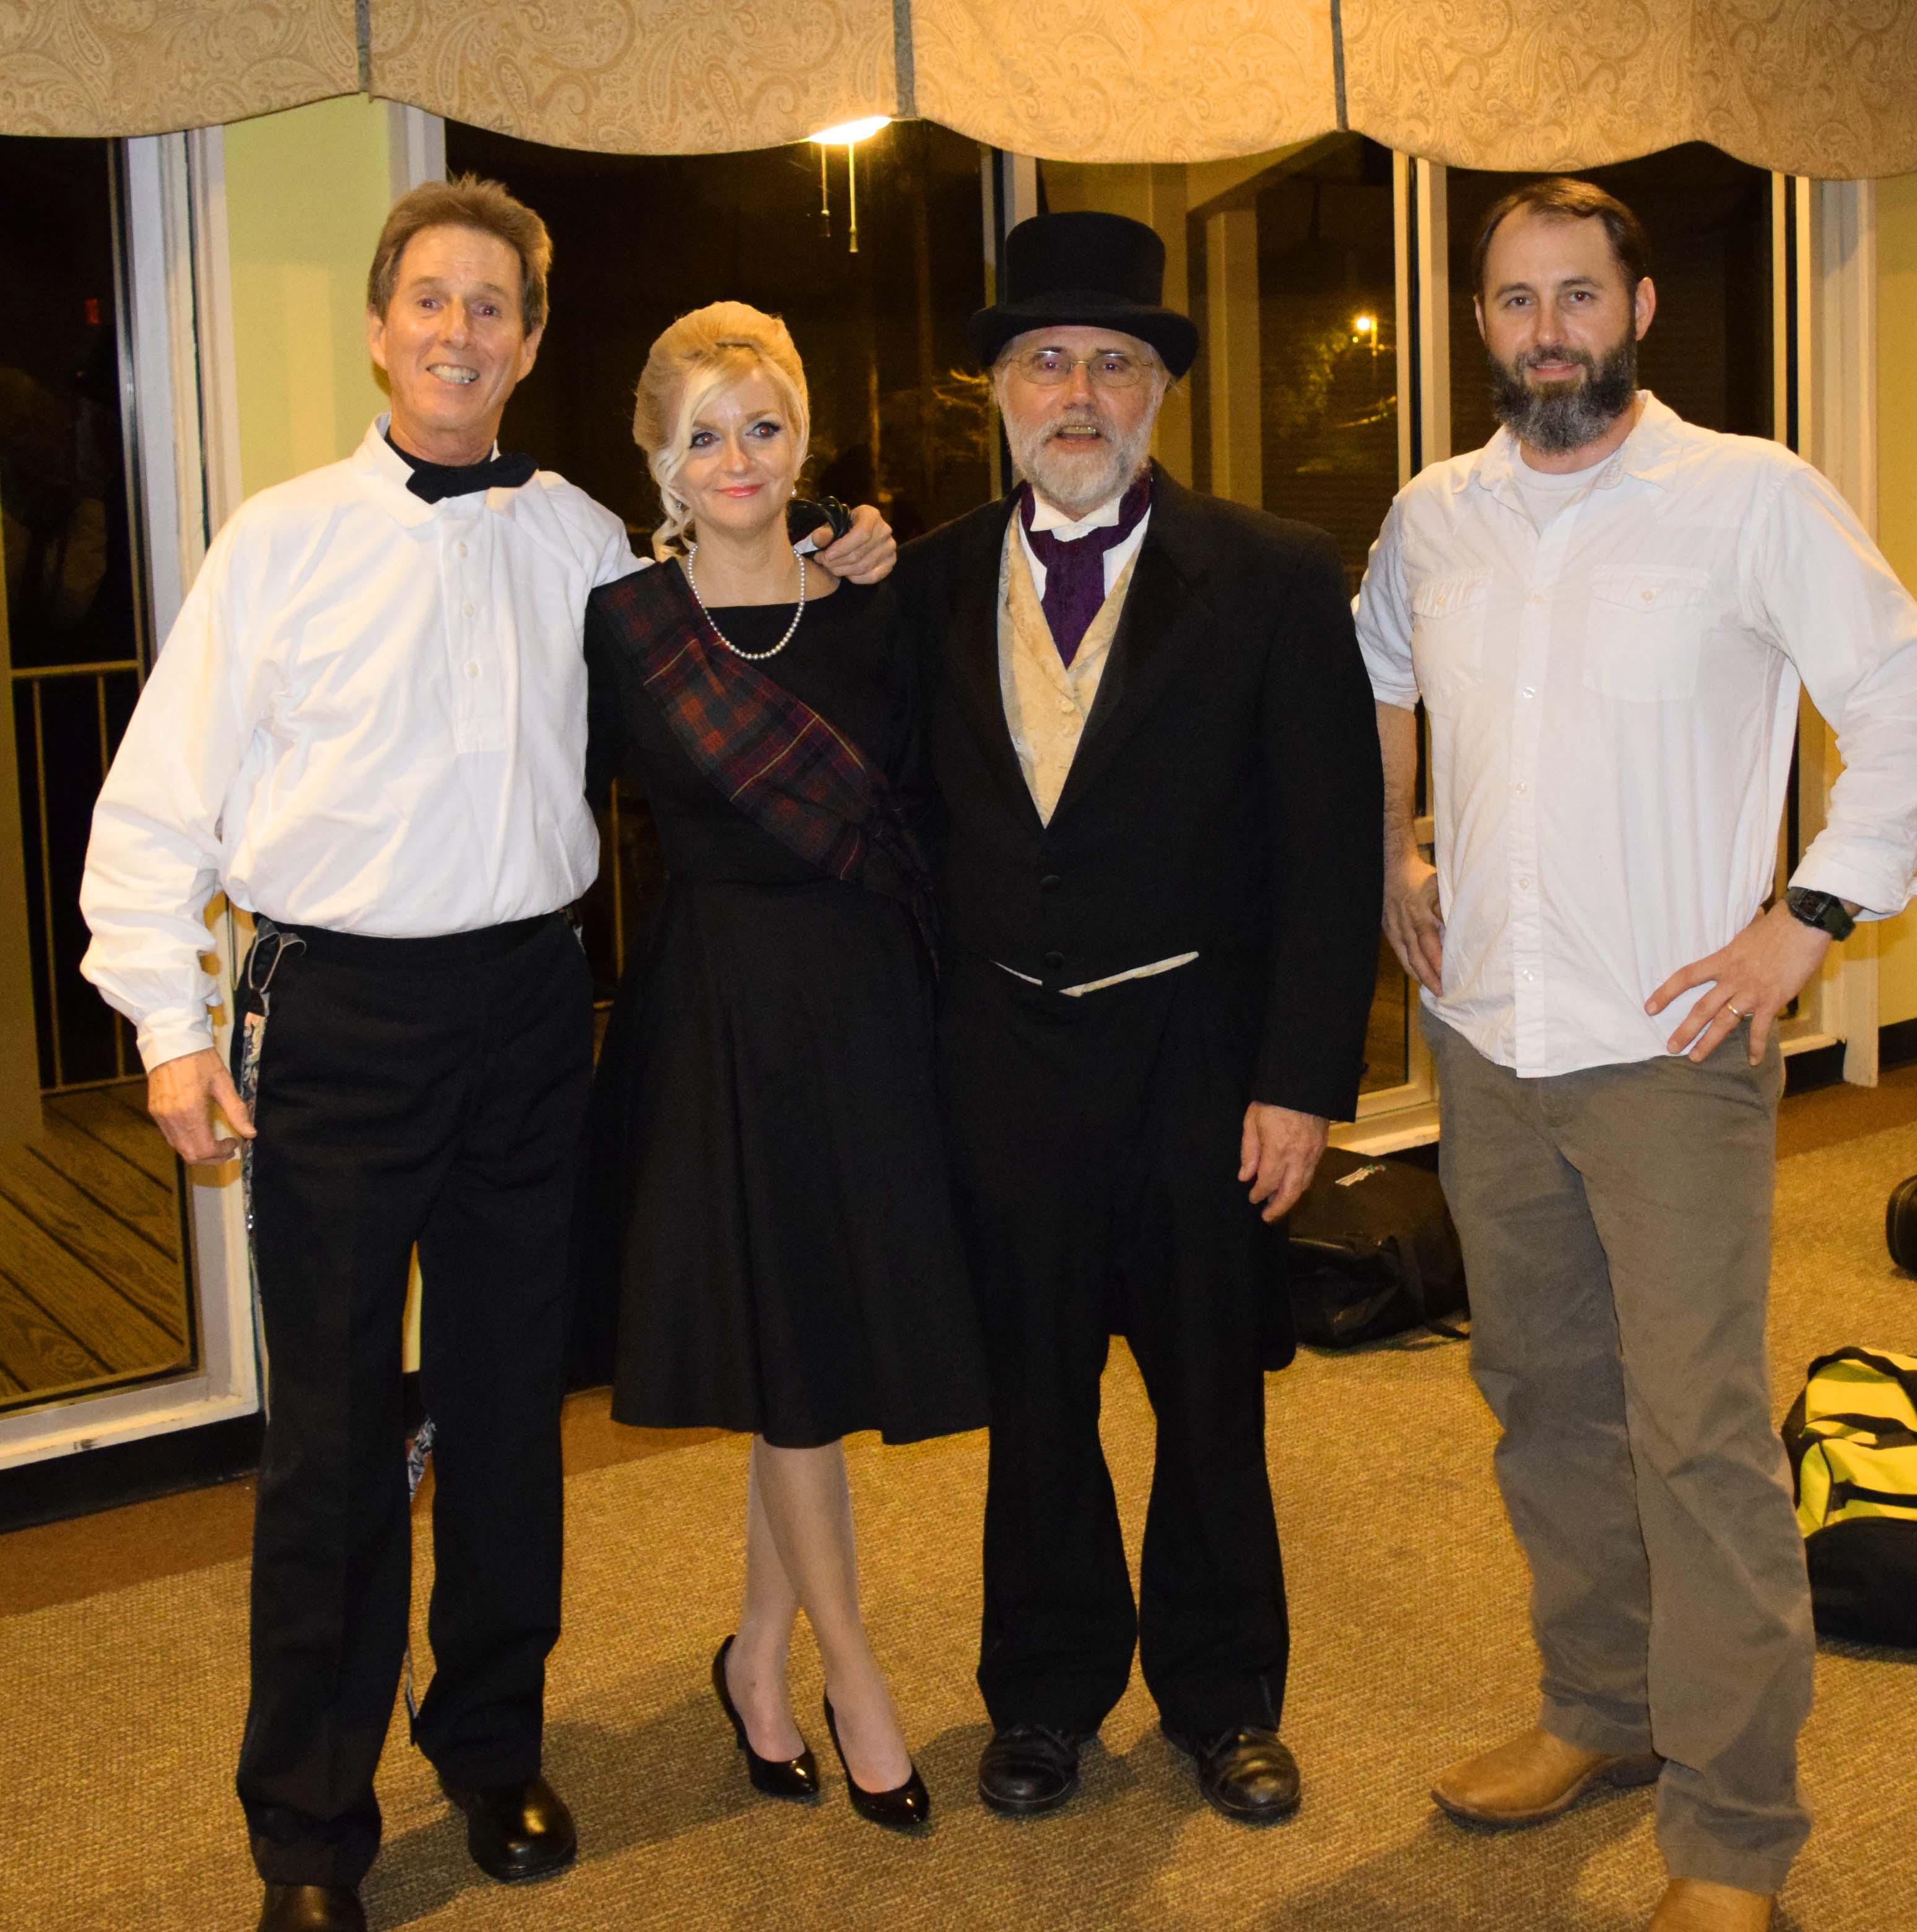 Gordon, Shelia, Frank, and Forrest